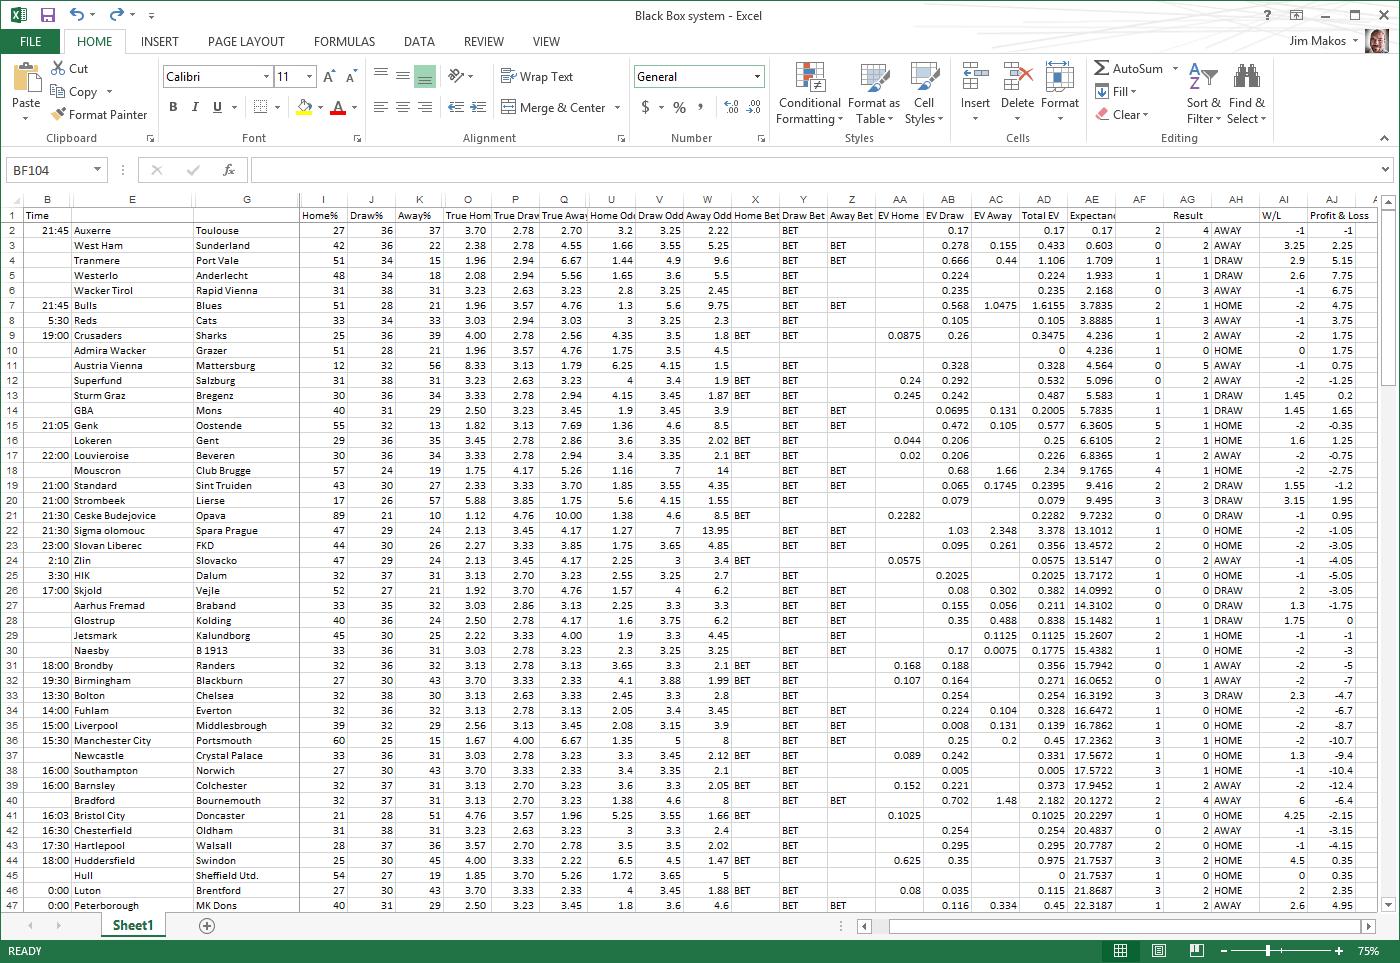 Gambling Winnings 2020 -60460